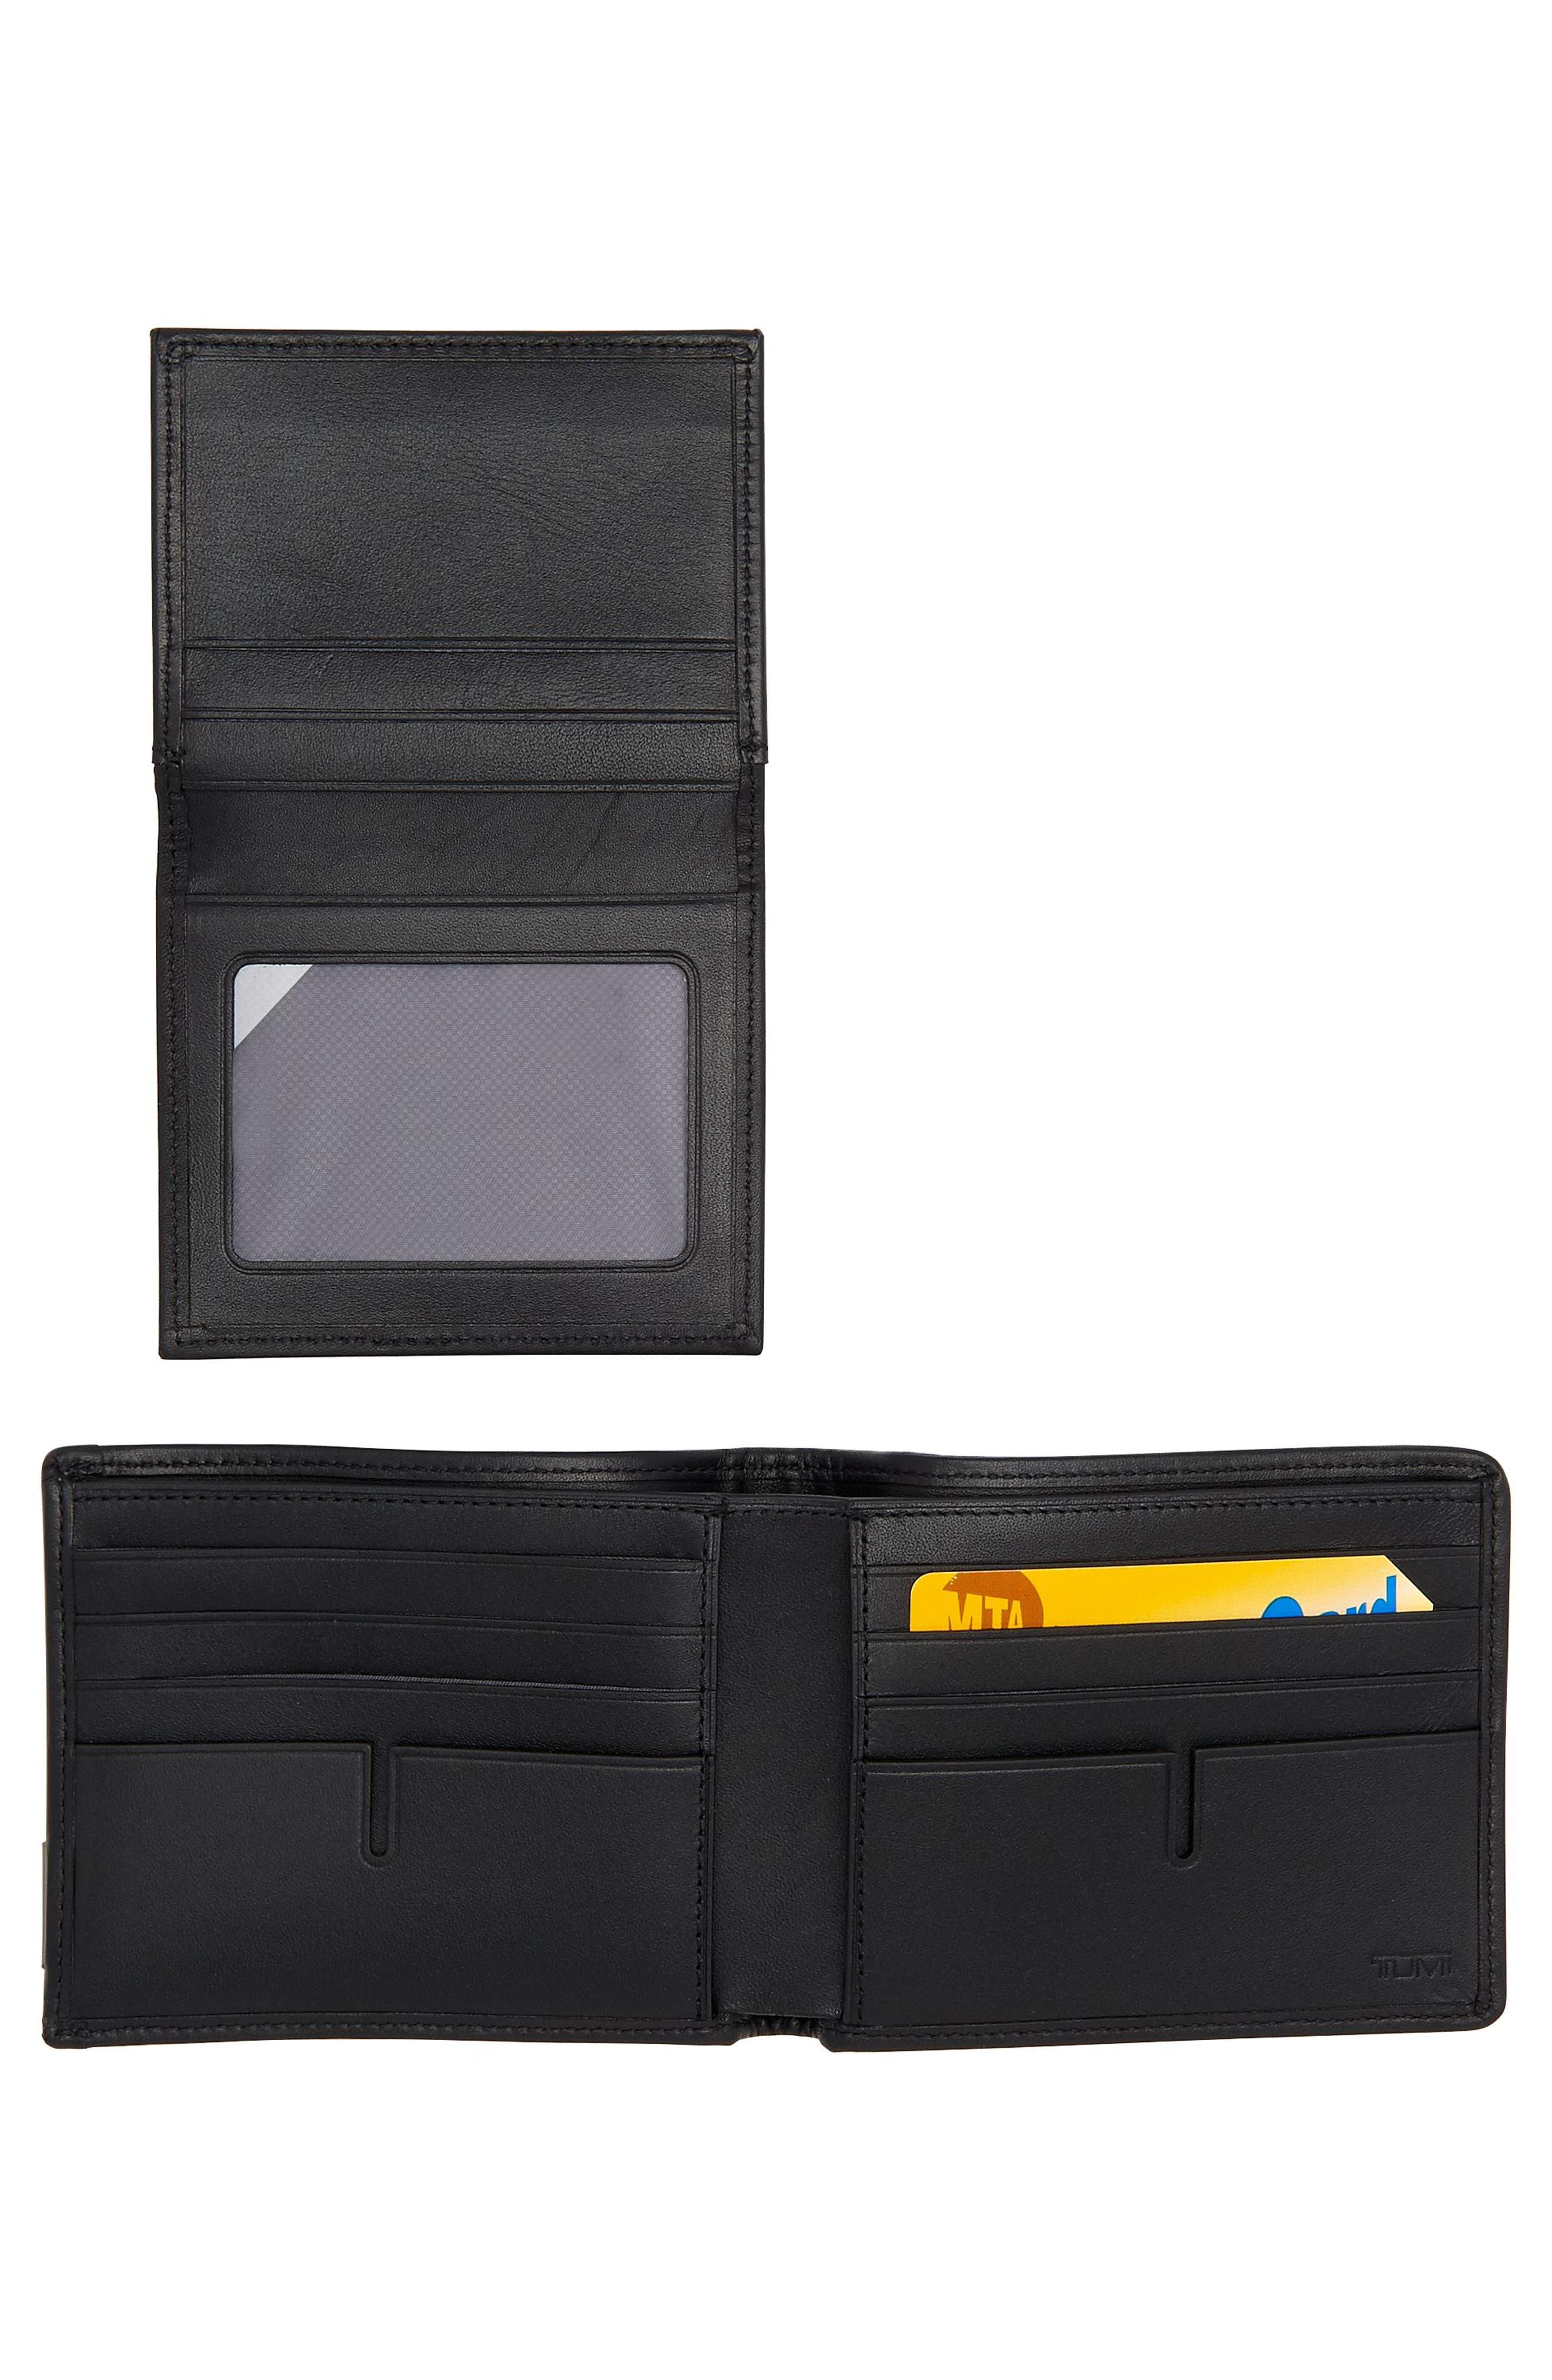 Alpha Global Pass Case Wallet,                             Alternate thumbnail 3, color,                             Anthracite/ Black